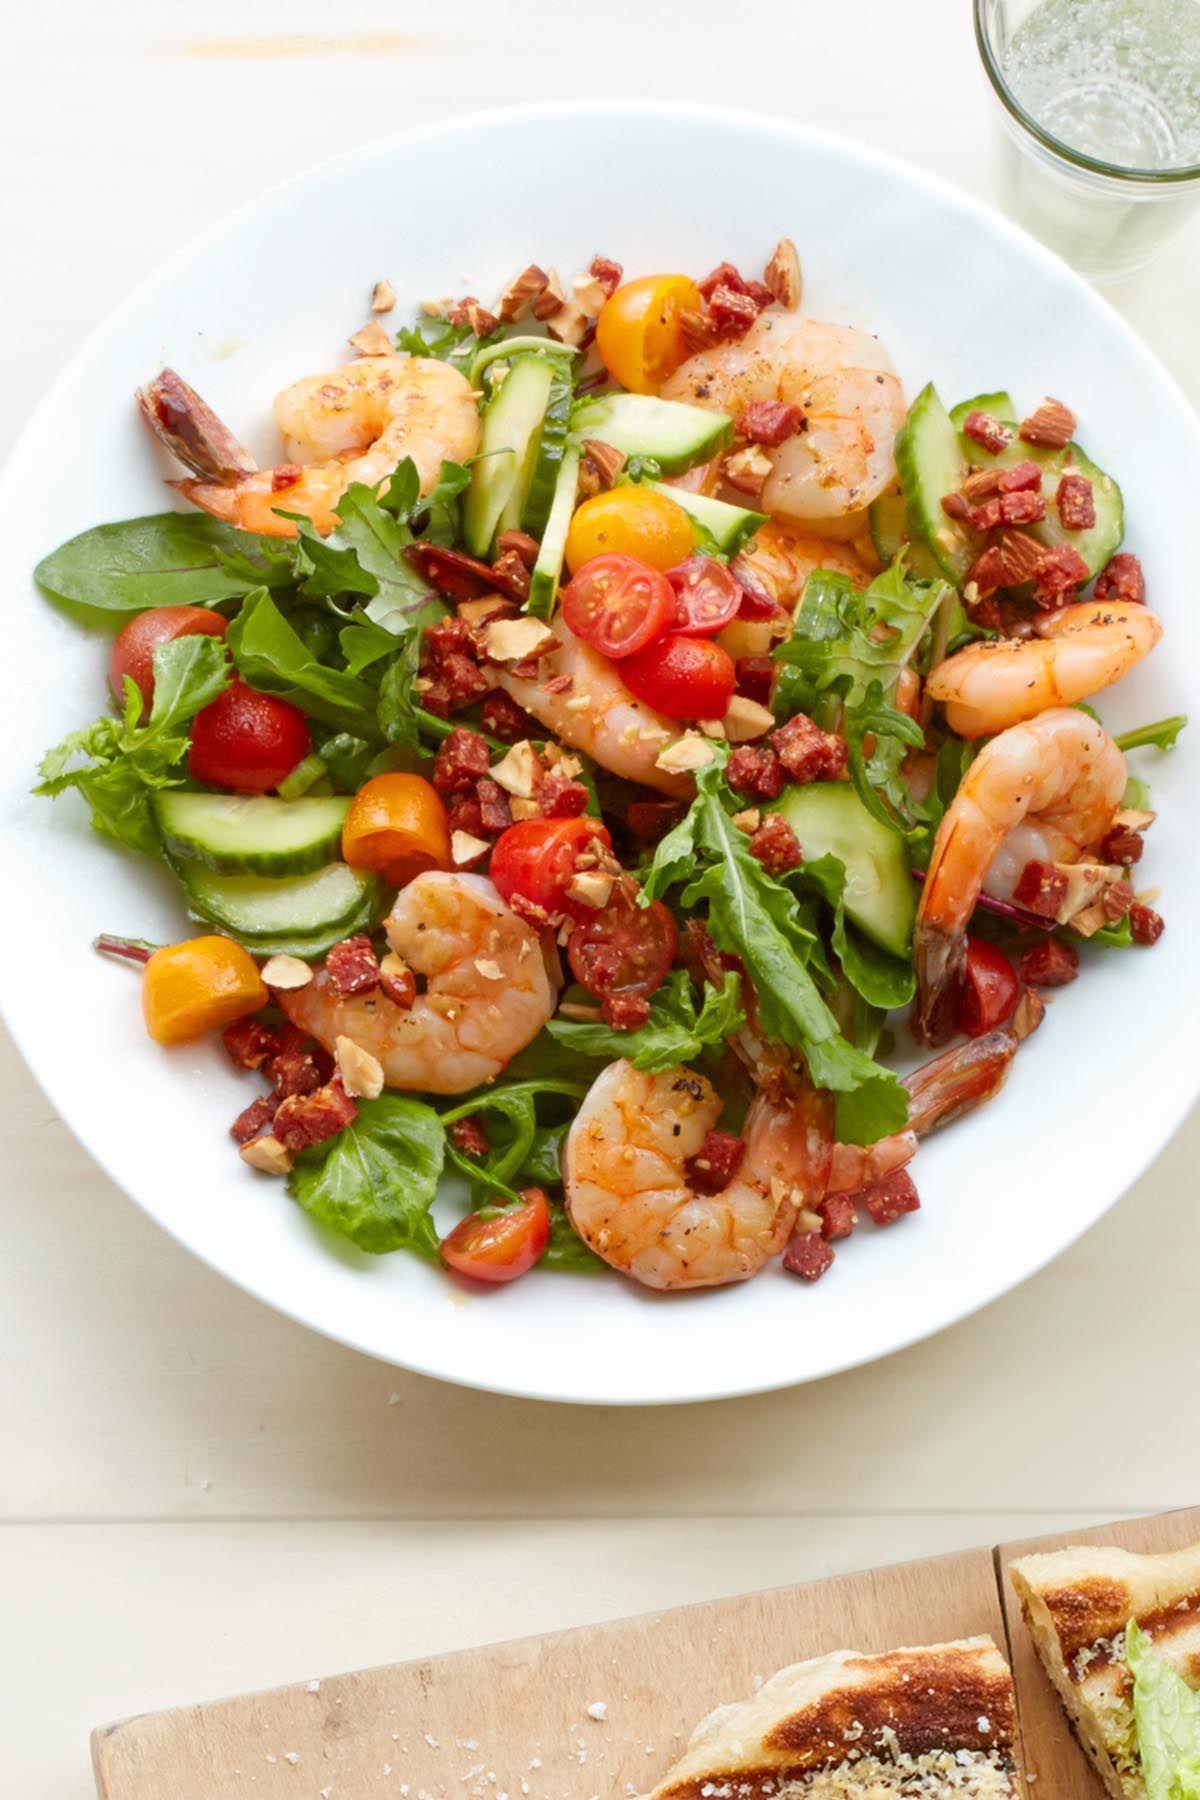 Shrimp Salad with Crispy Chorizo and Almonds